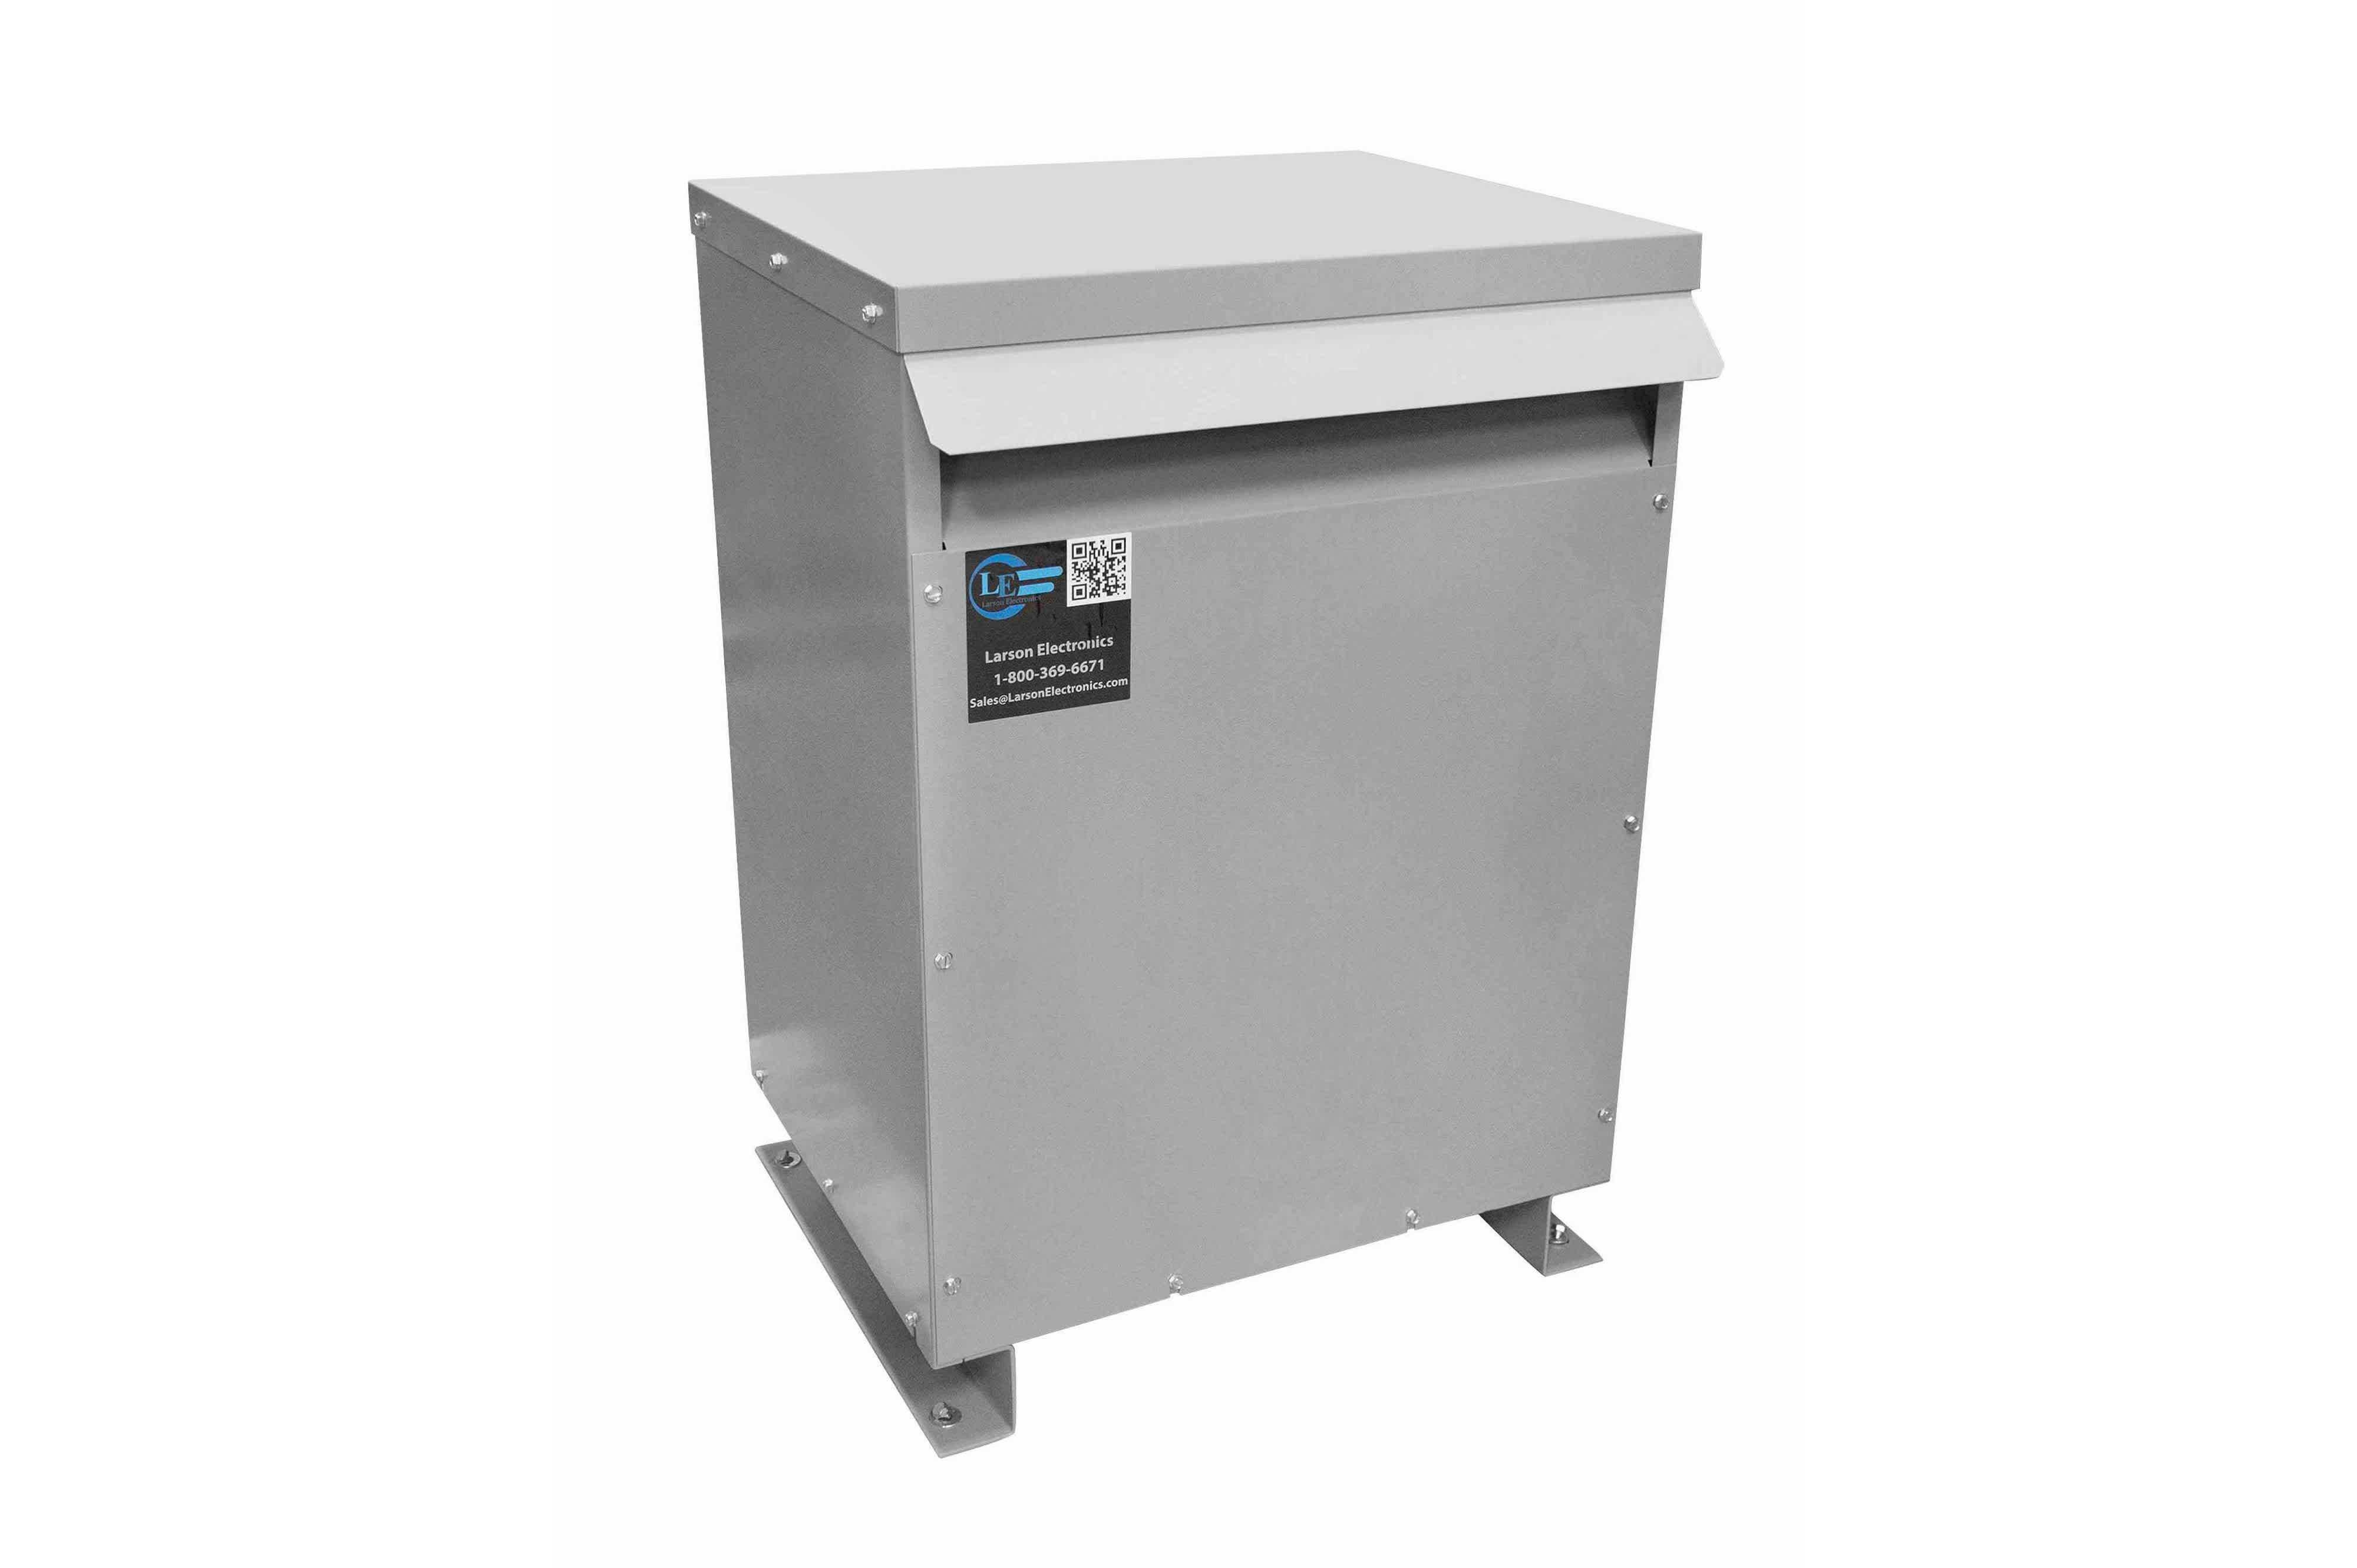 35 kVA 3PH Isolation Transformer, 415V Wye Primary, 240V Delta Secondary, N3R, Ventilated, 60 Hz